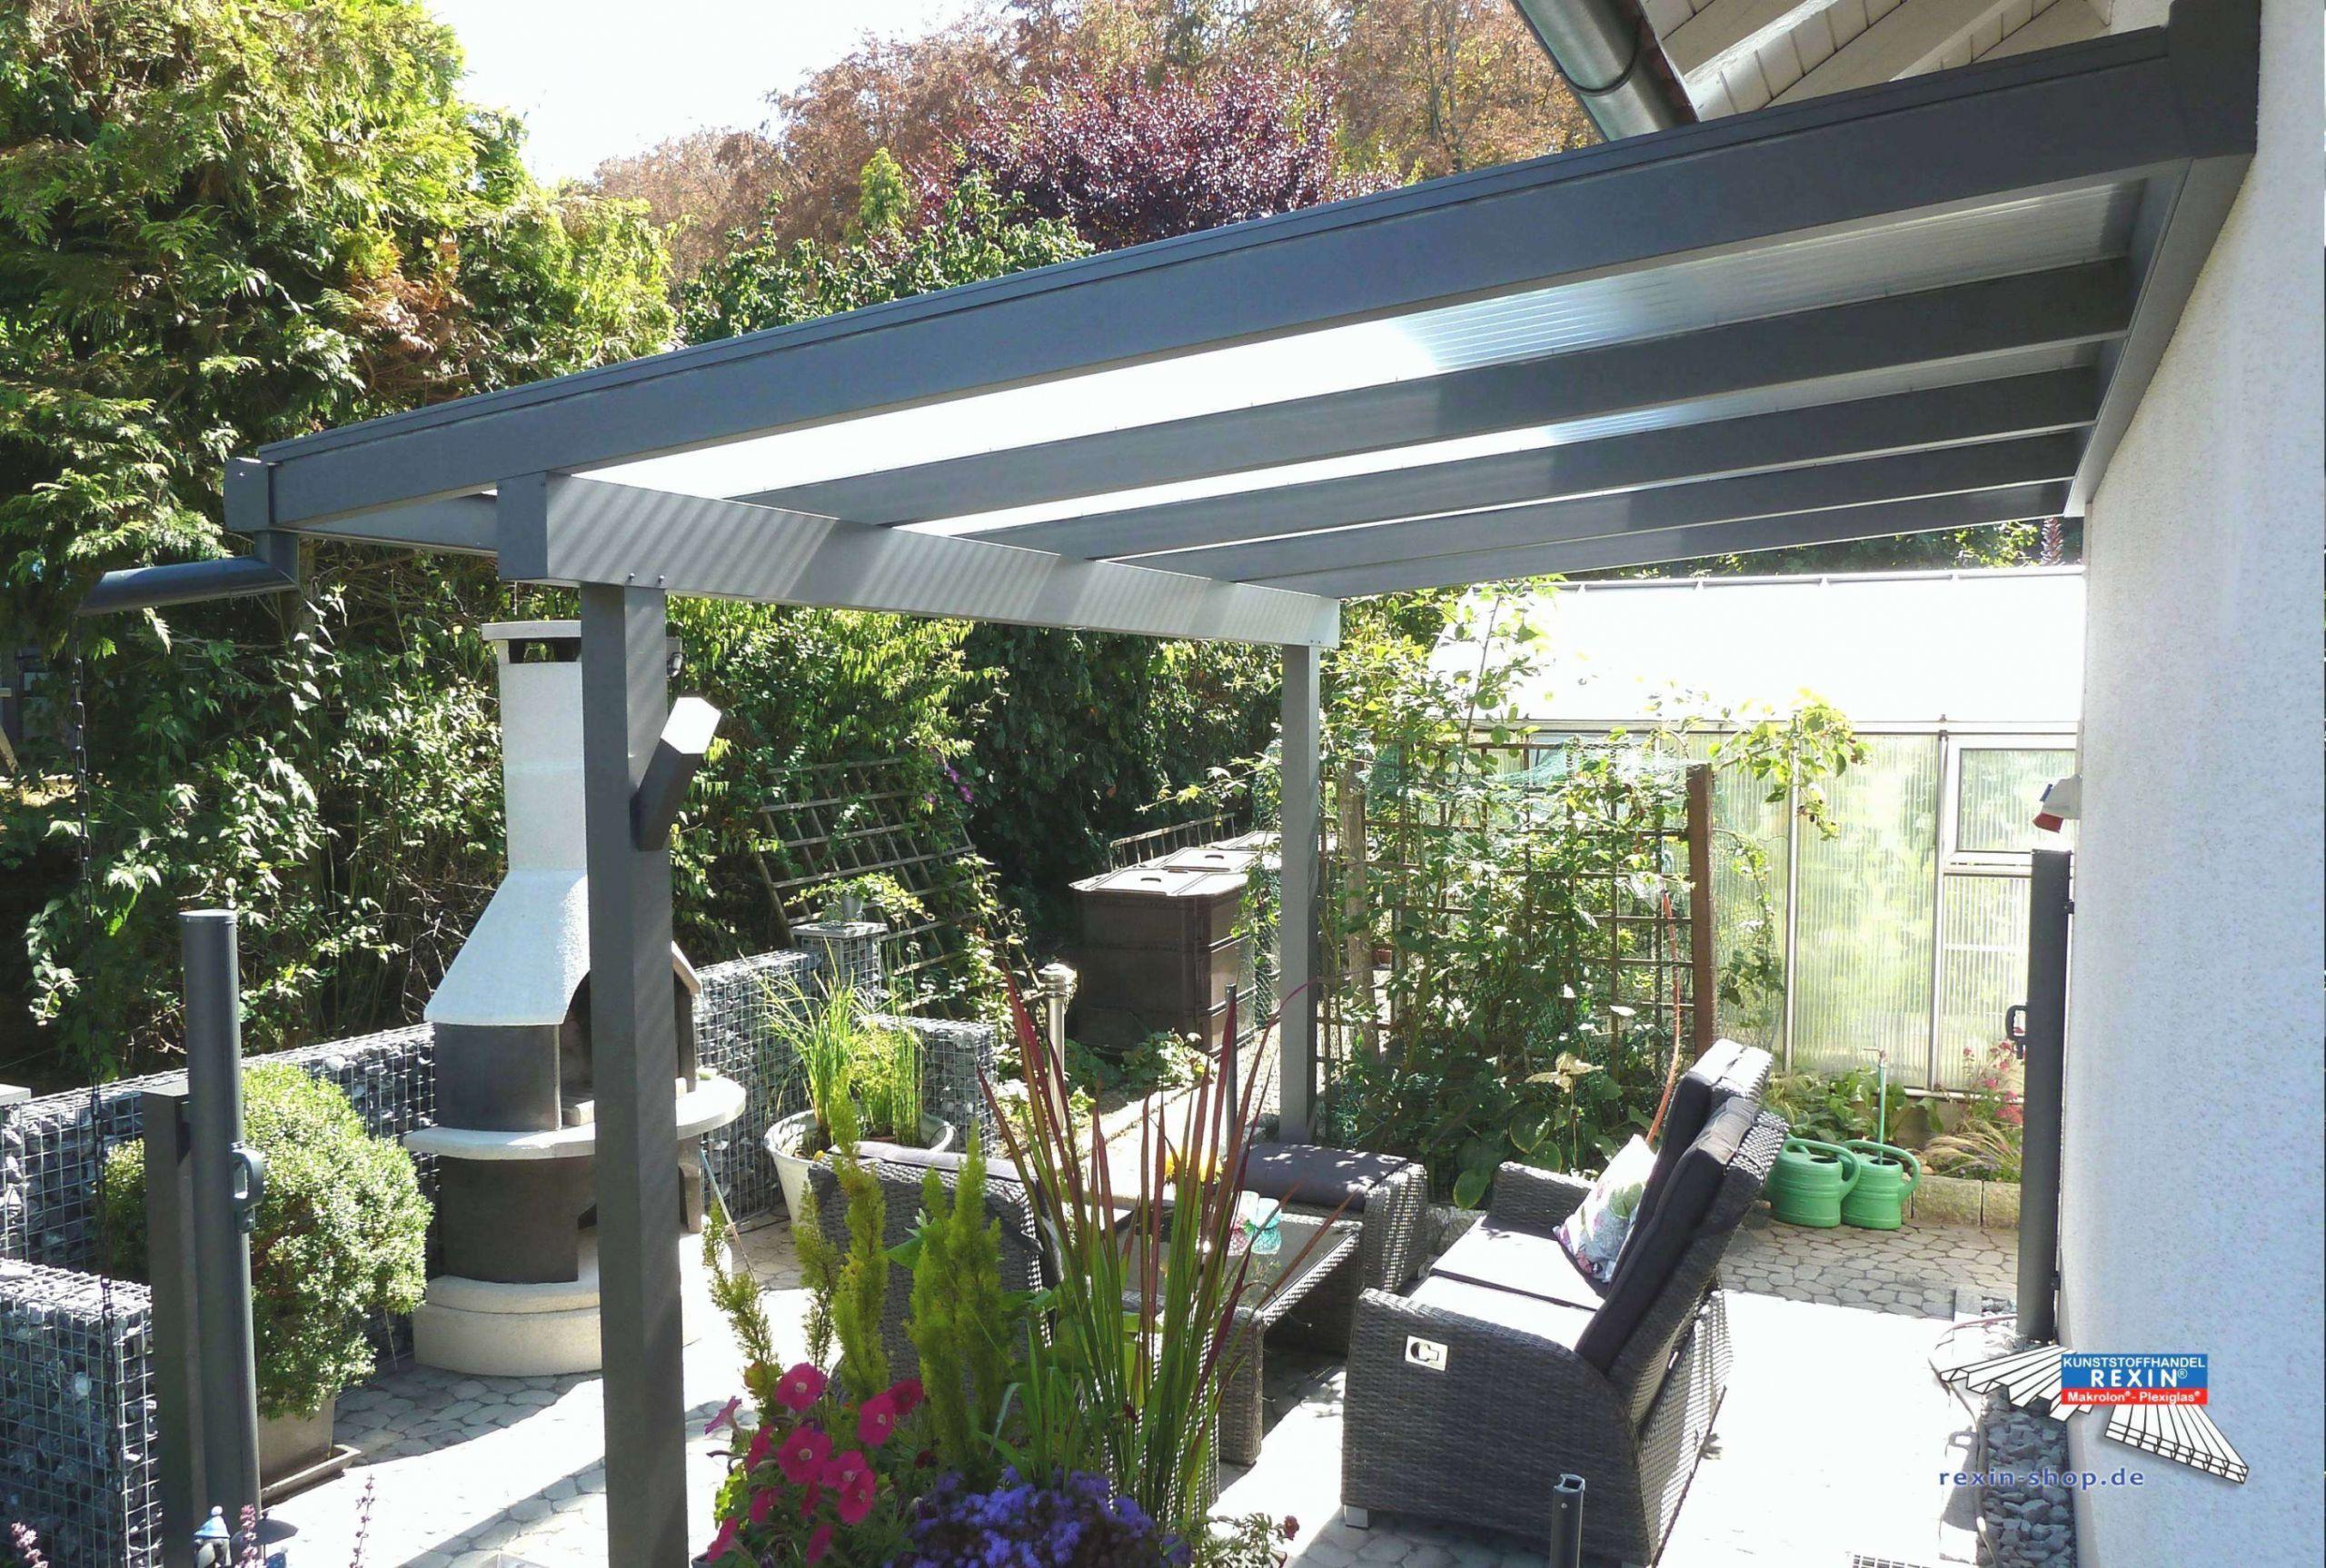 Garten Deko Ideen Selbermachen Luxus Gartendeko Selbst Gemacht — Temobardz Home Blog